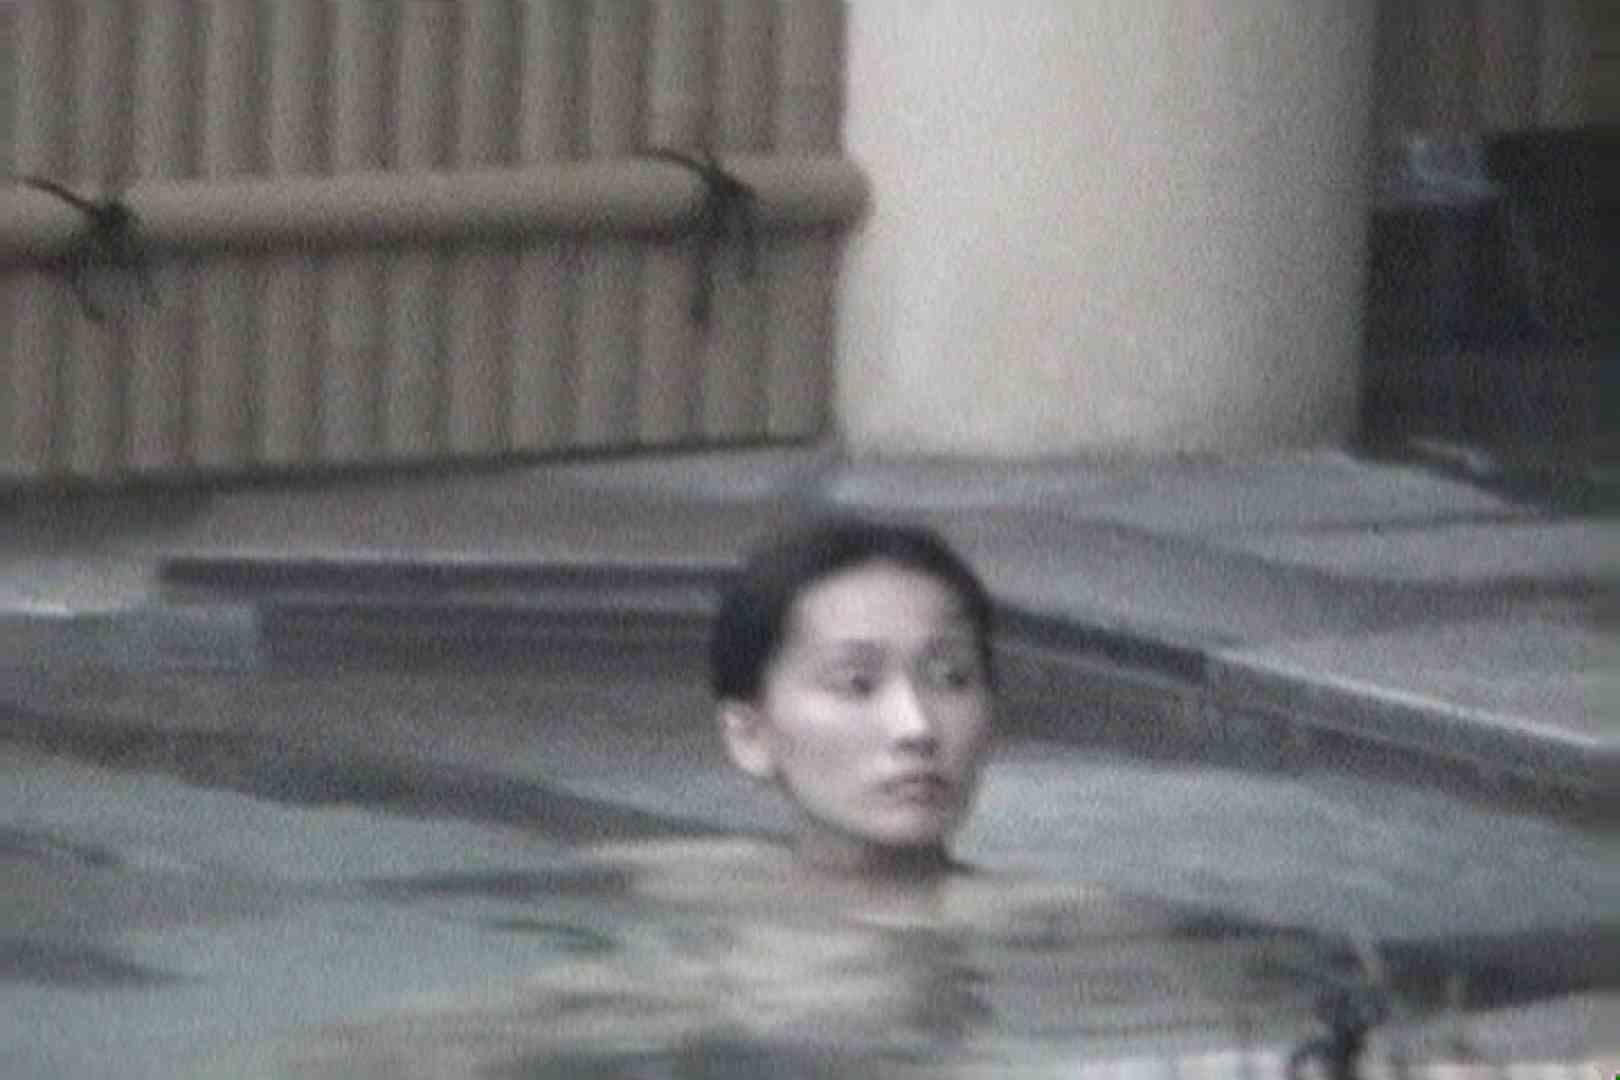 Aquaな露天風呂Vol.557 露天風呂編 | 盗撮シリーズ  100PIX 3